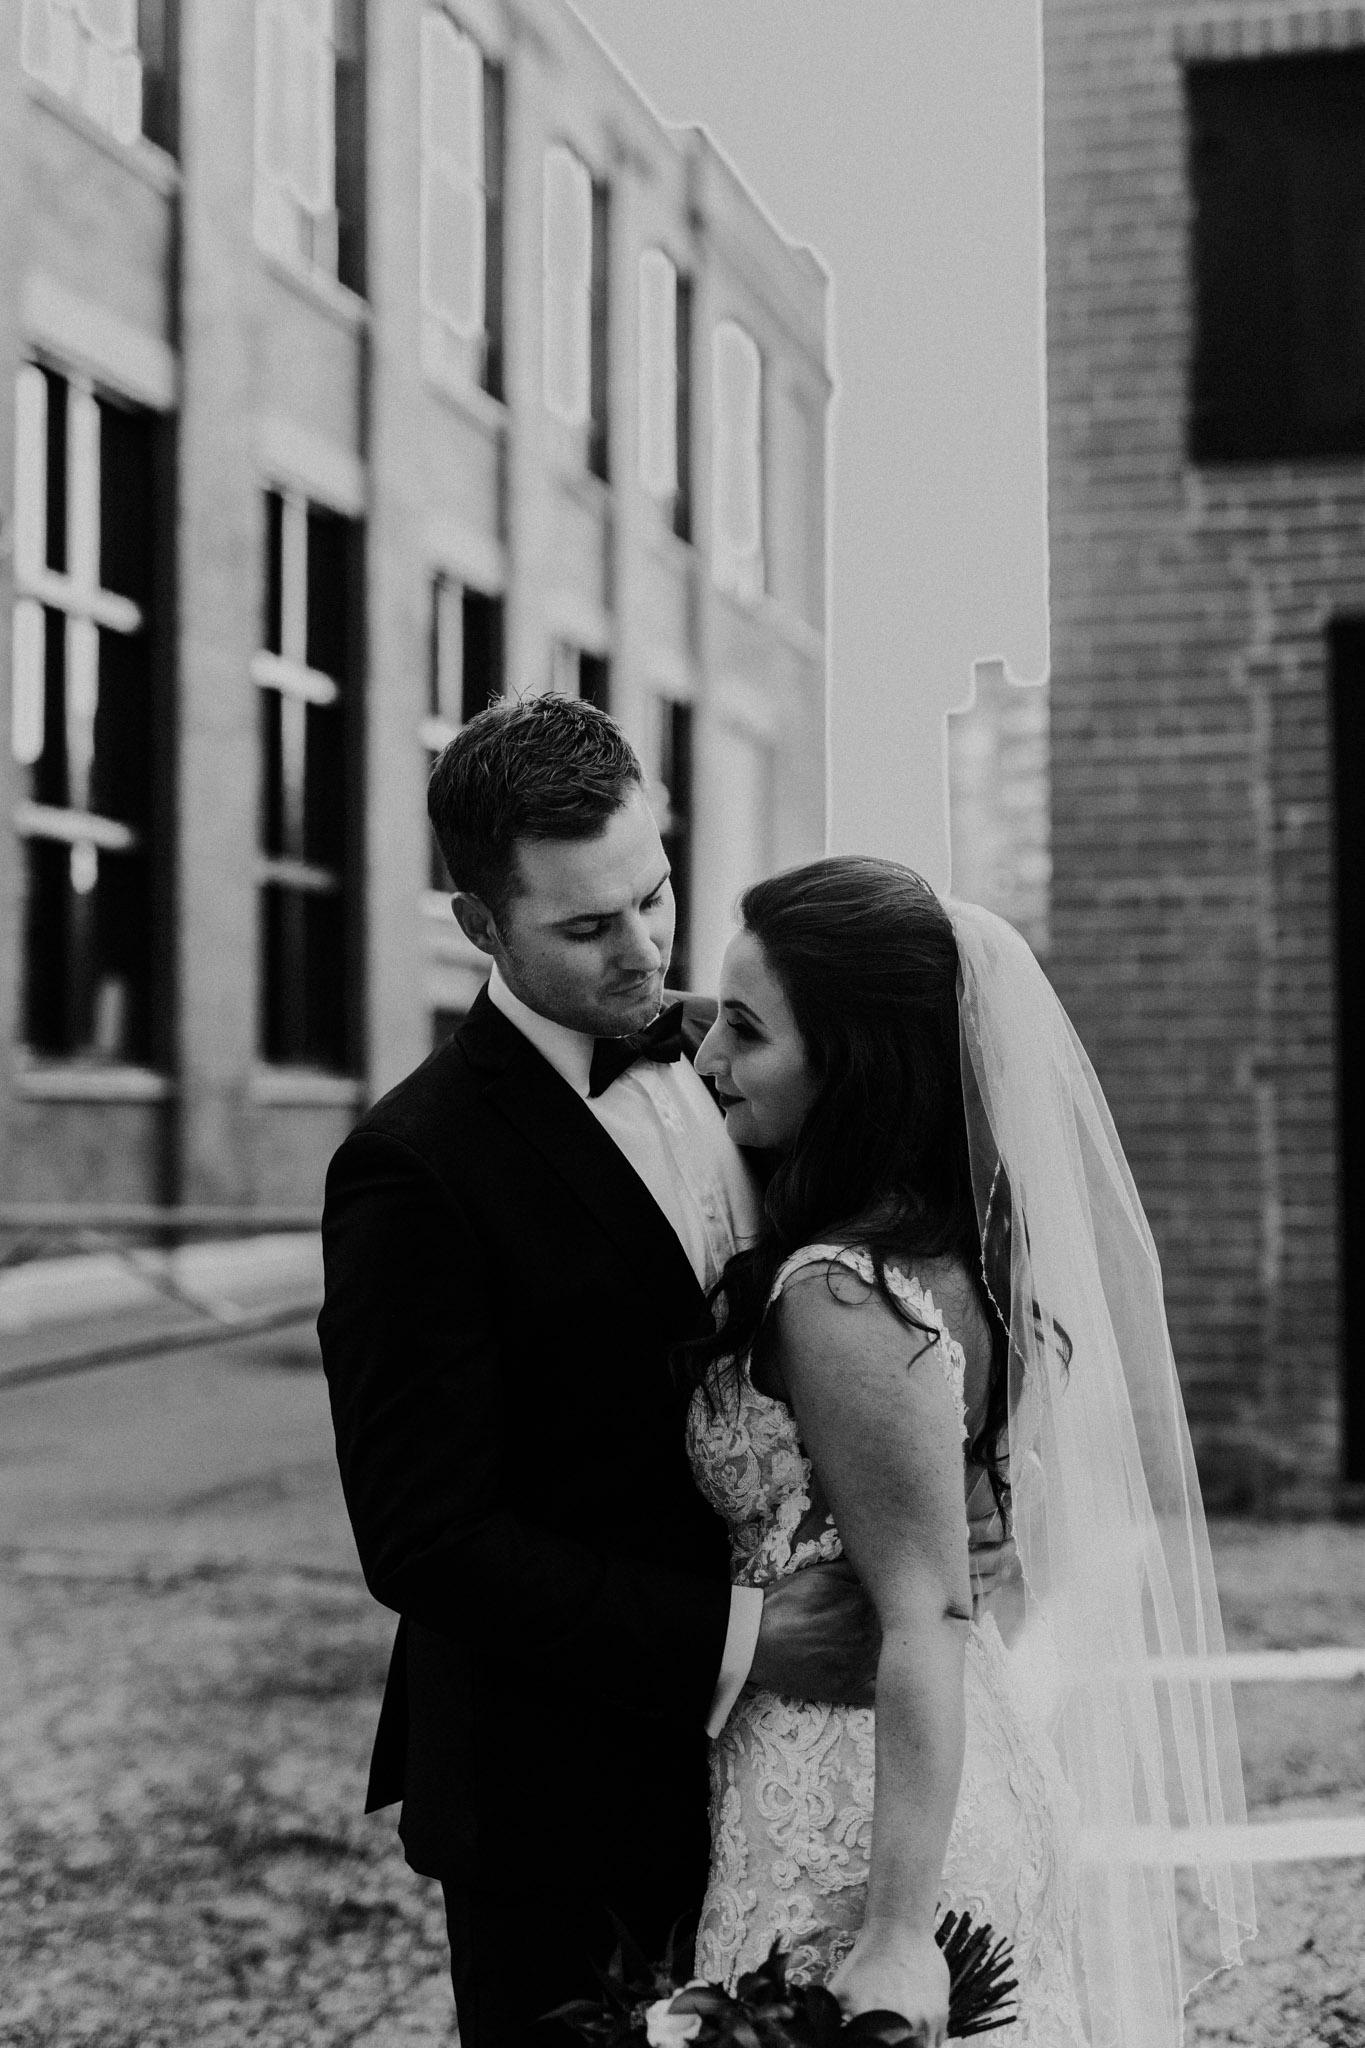 Liberty Village Wedding - Black and white photo of newlyweds embracing